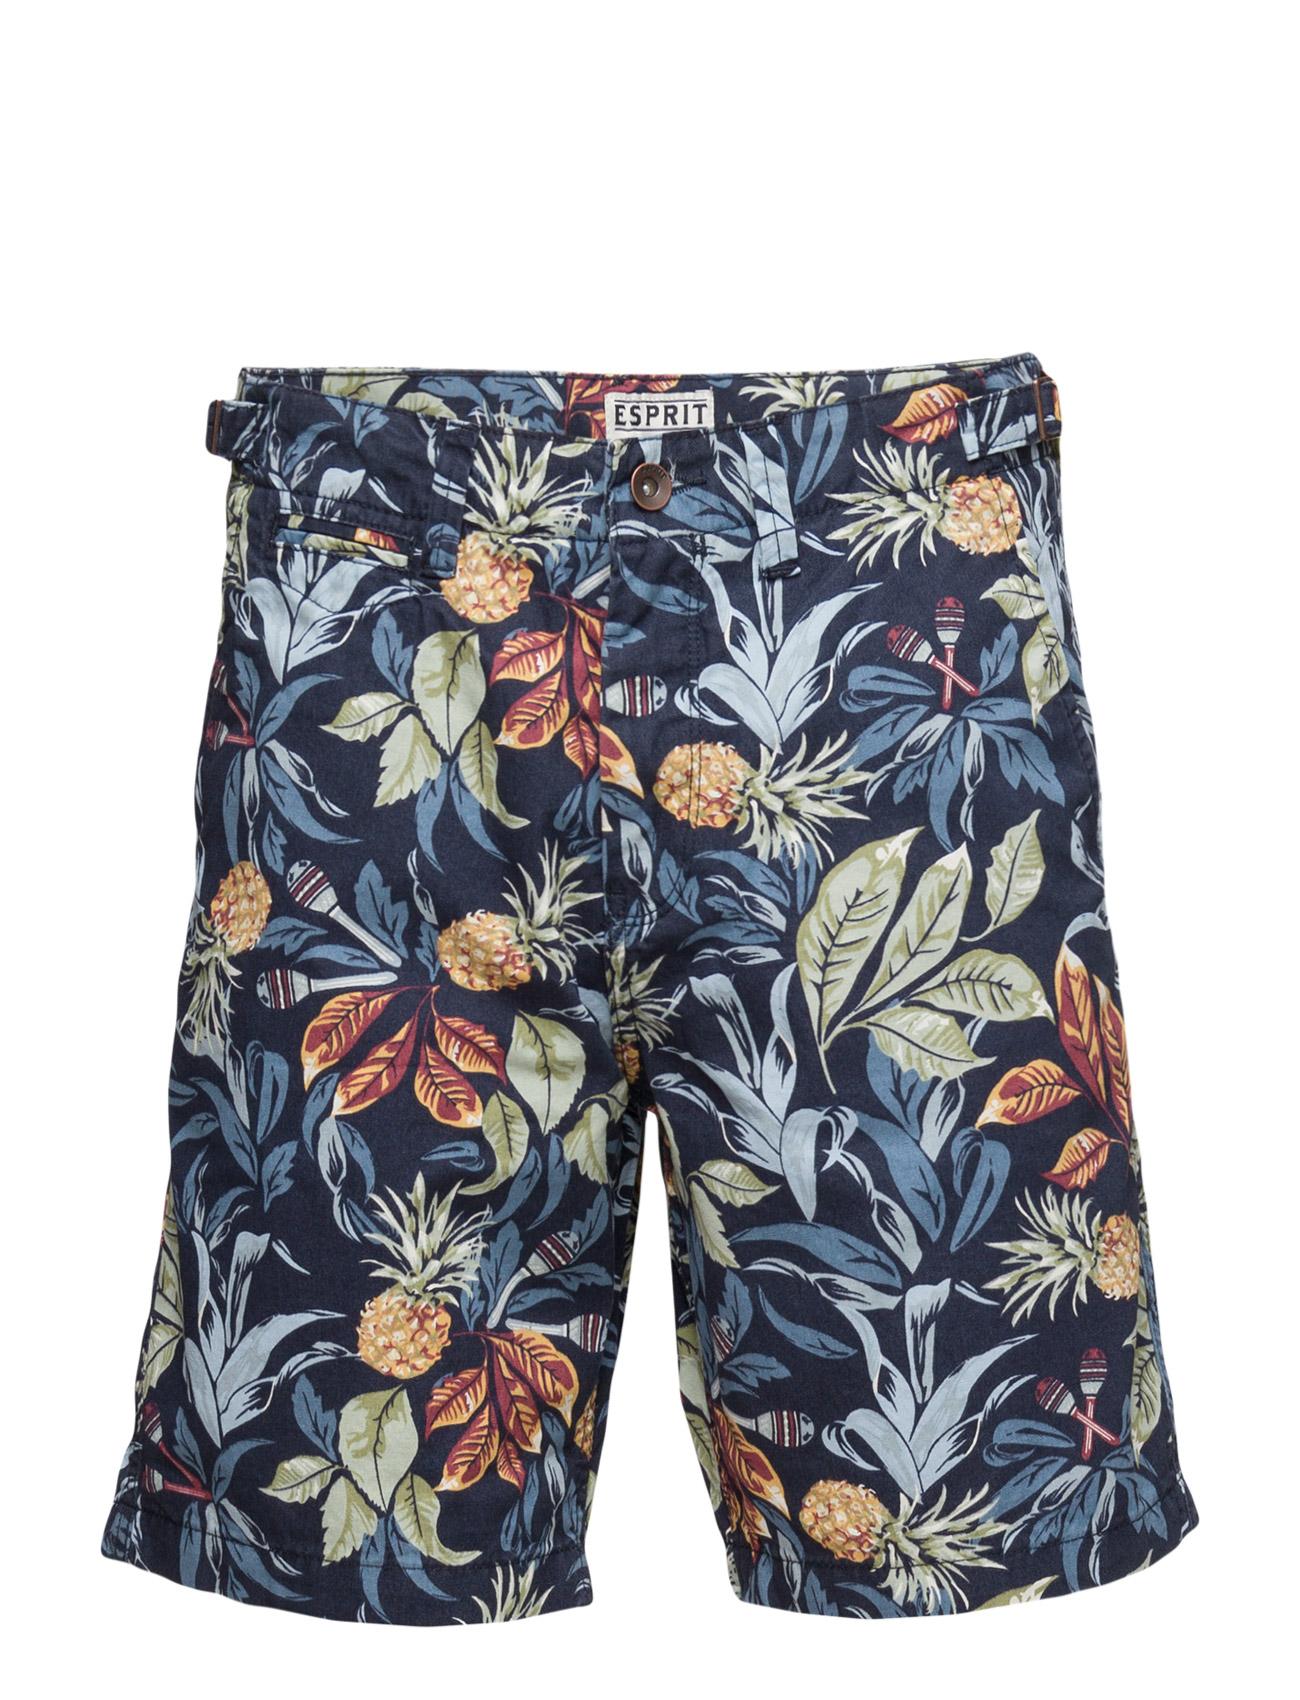 Shorts Woven Esprit Casual Bermuda shorts til Herrer i Navy blå